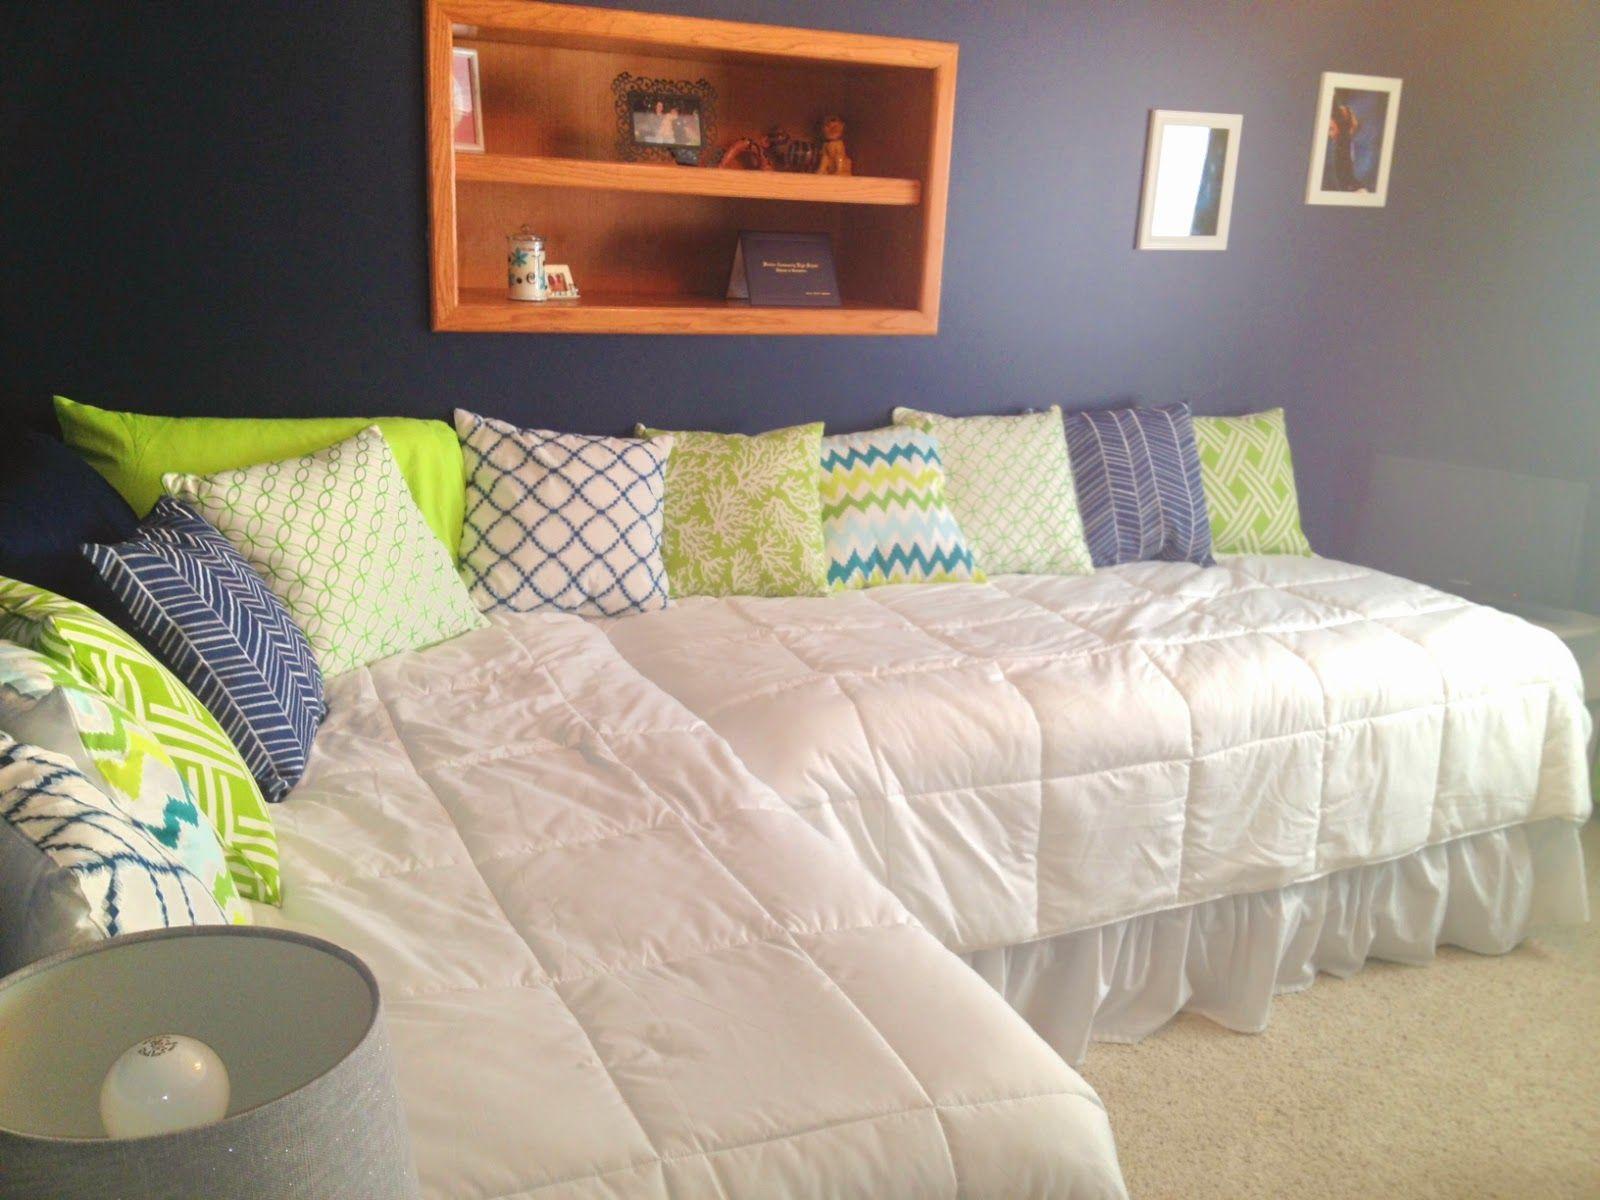 Nicole Michael Crochet Off Subject Room Makeover Bedroom Makeover Room Makeover Kids Shared Bedroom